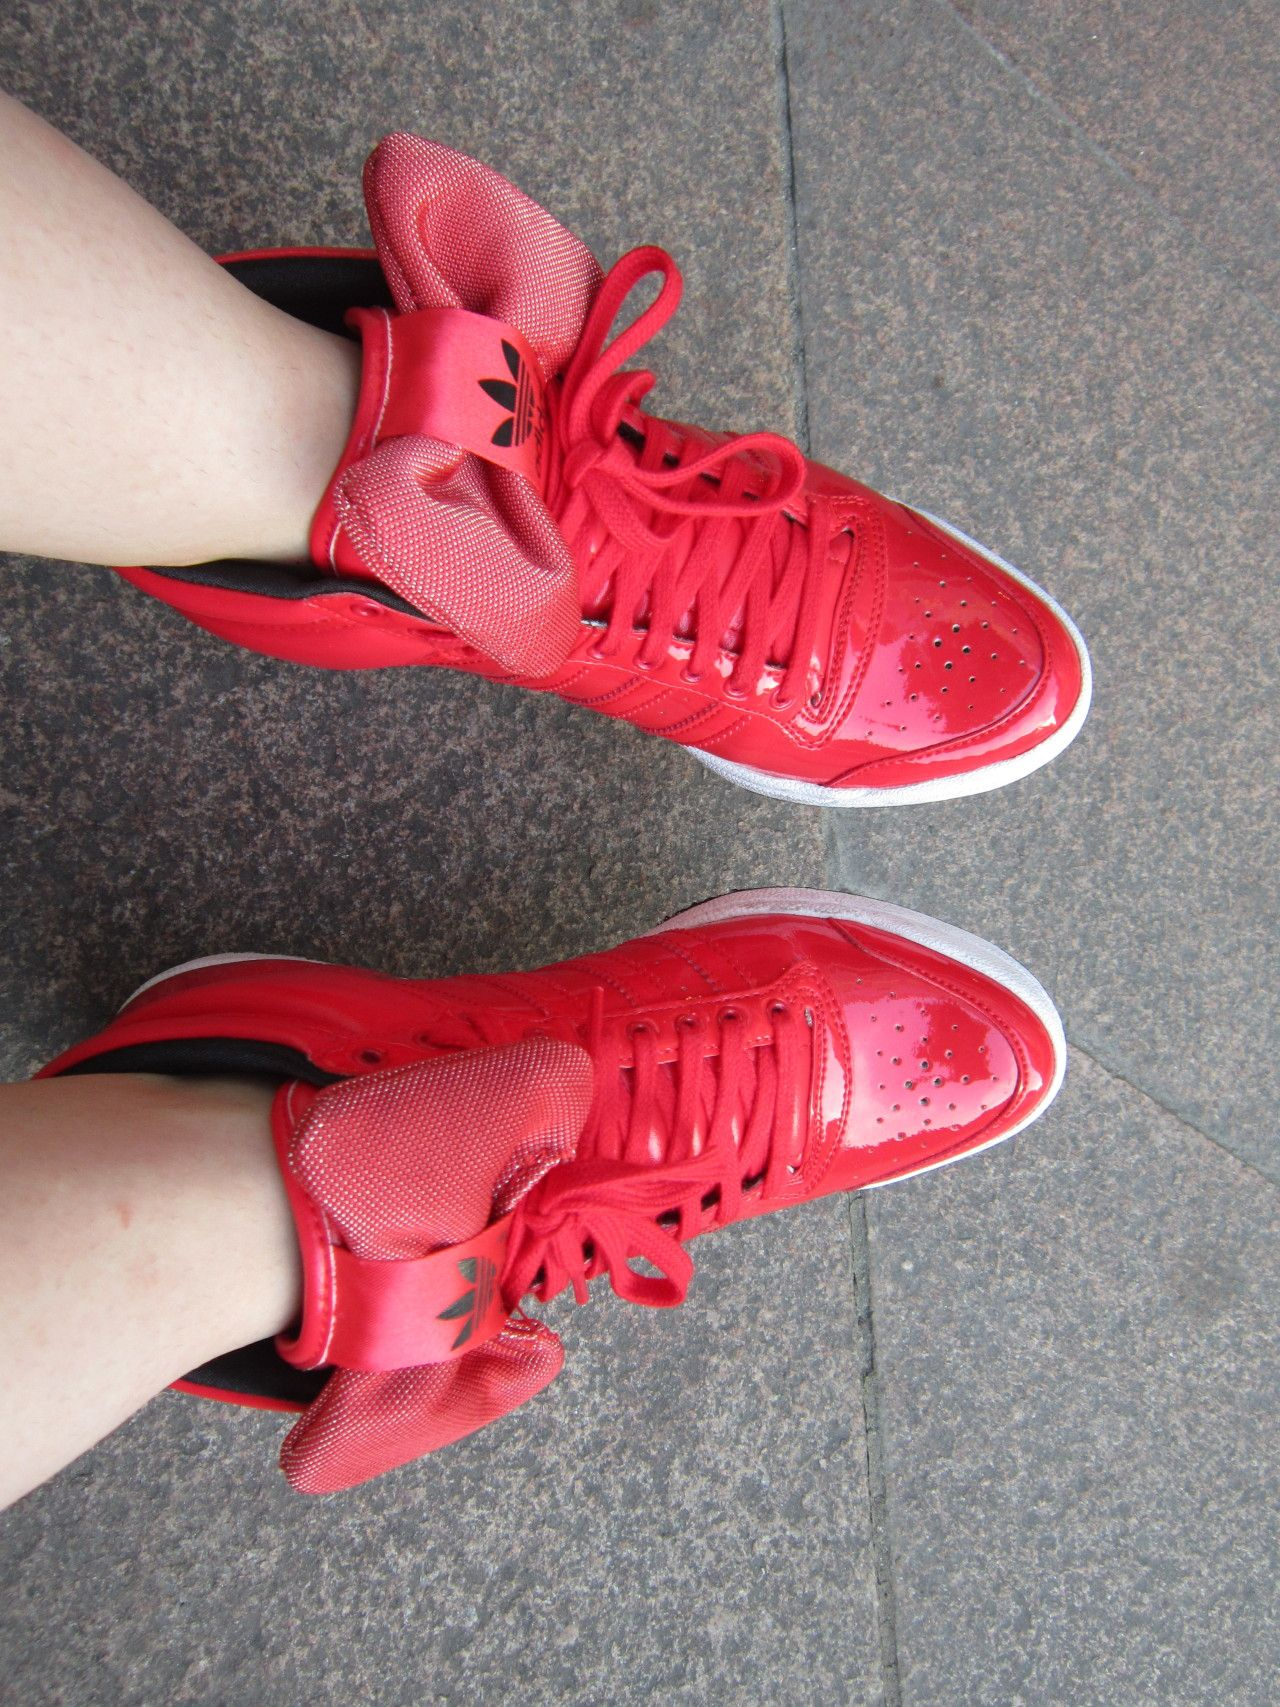 sports shoes d9c8a f0014 Super cute Adidas tee! We like adidas at Sportdecals! Get custom Adidas  gear today!